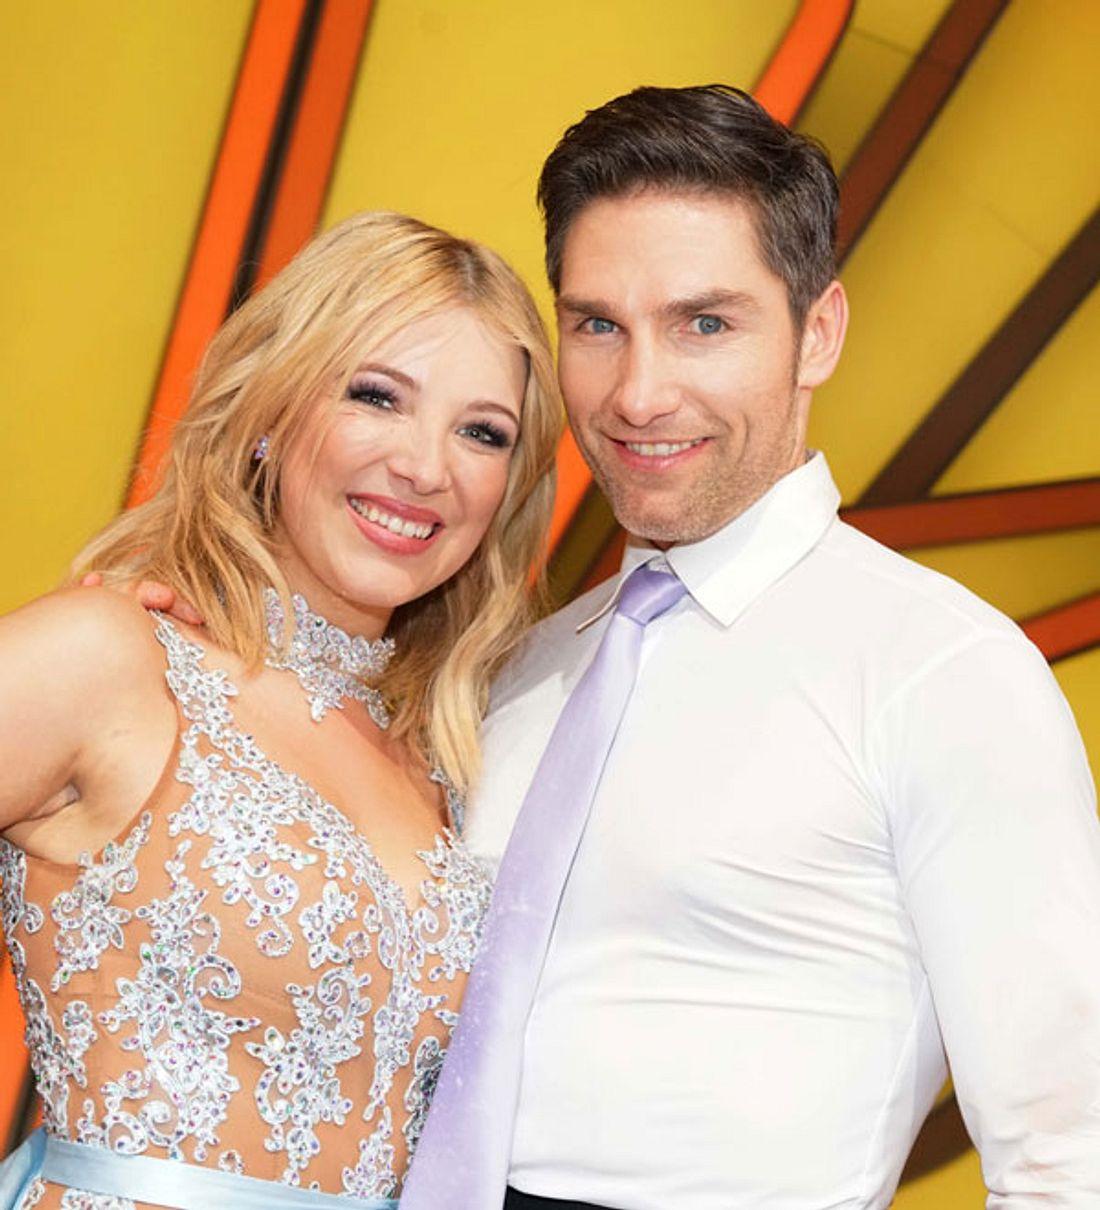 Iris Mareike Steen & Christian Polanc: Wundervolle Let's Dance-Neuigkeiten!